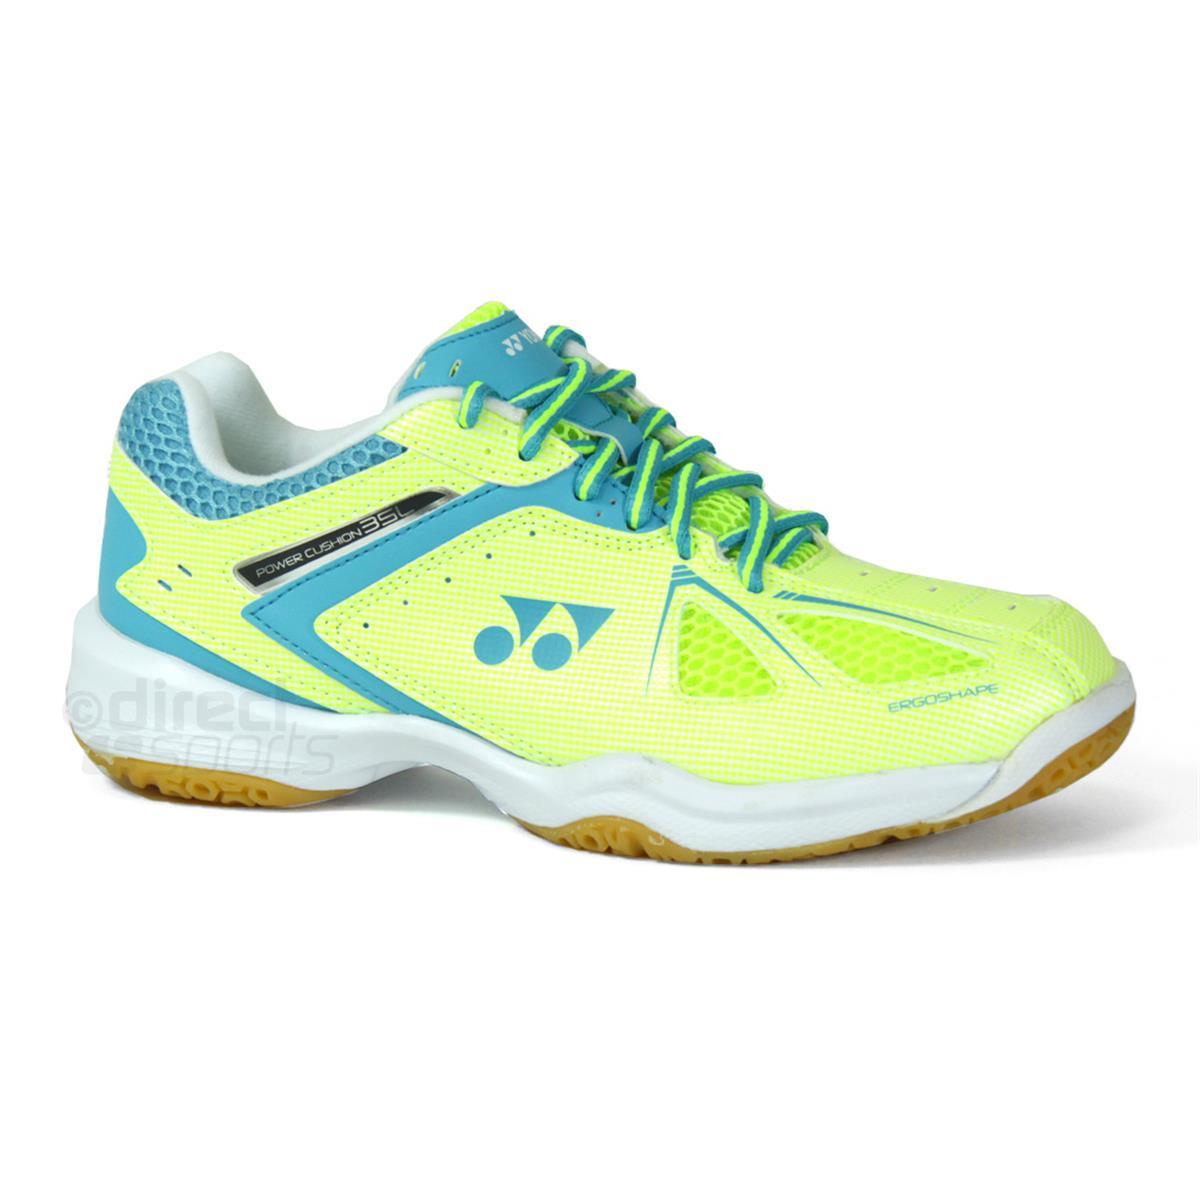 Yonex Womens Power Cushion 03zl Badminton Shoes yellow Squash